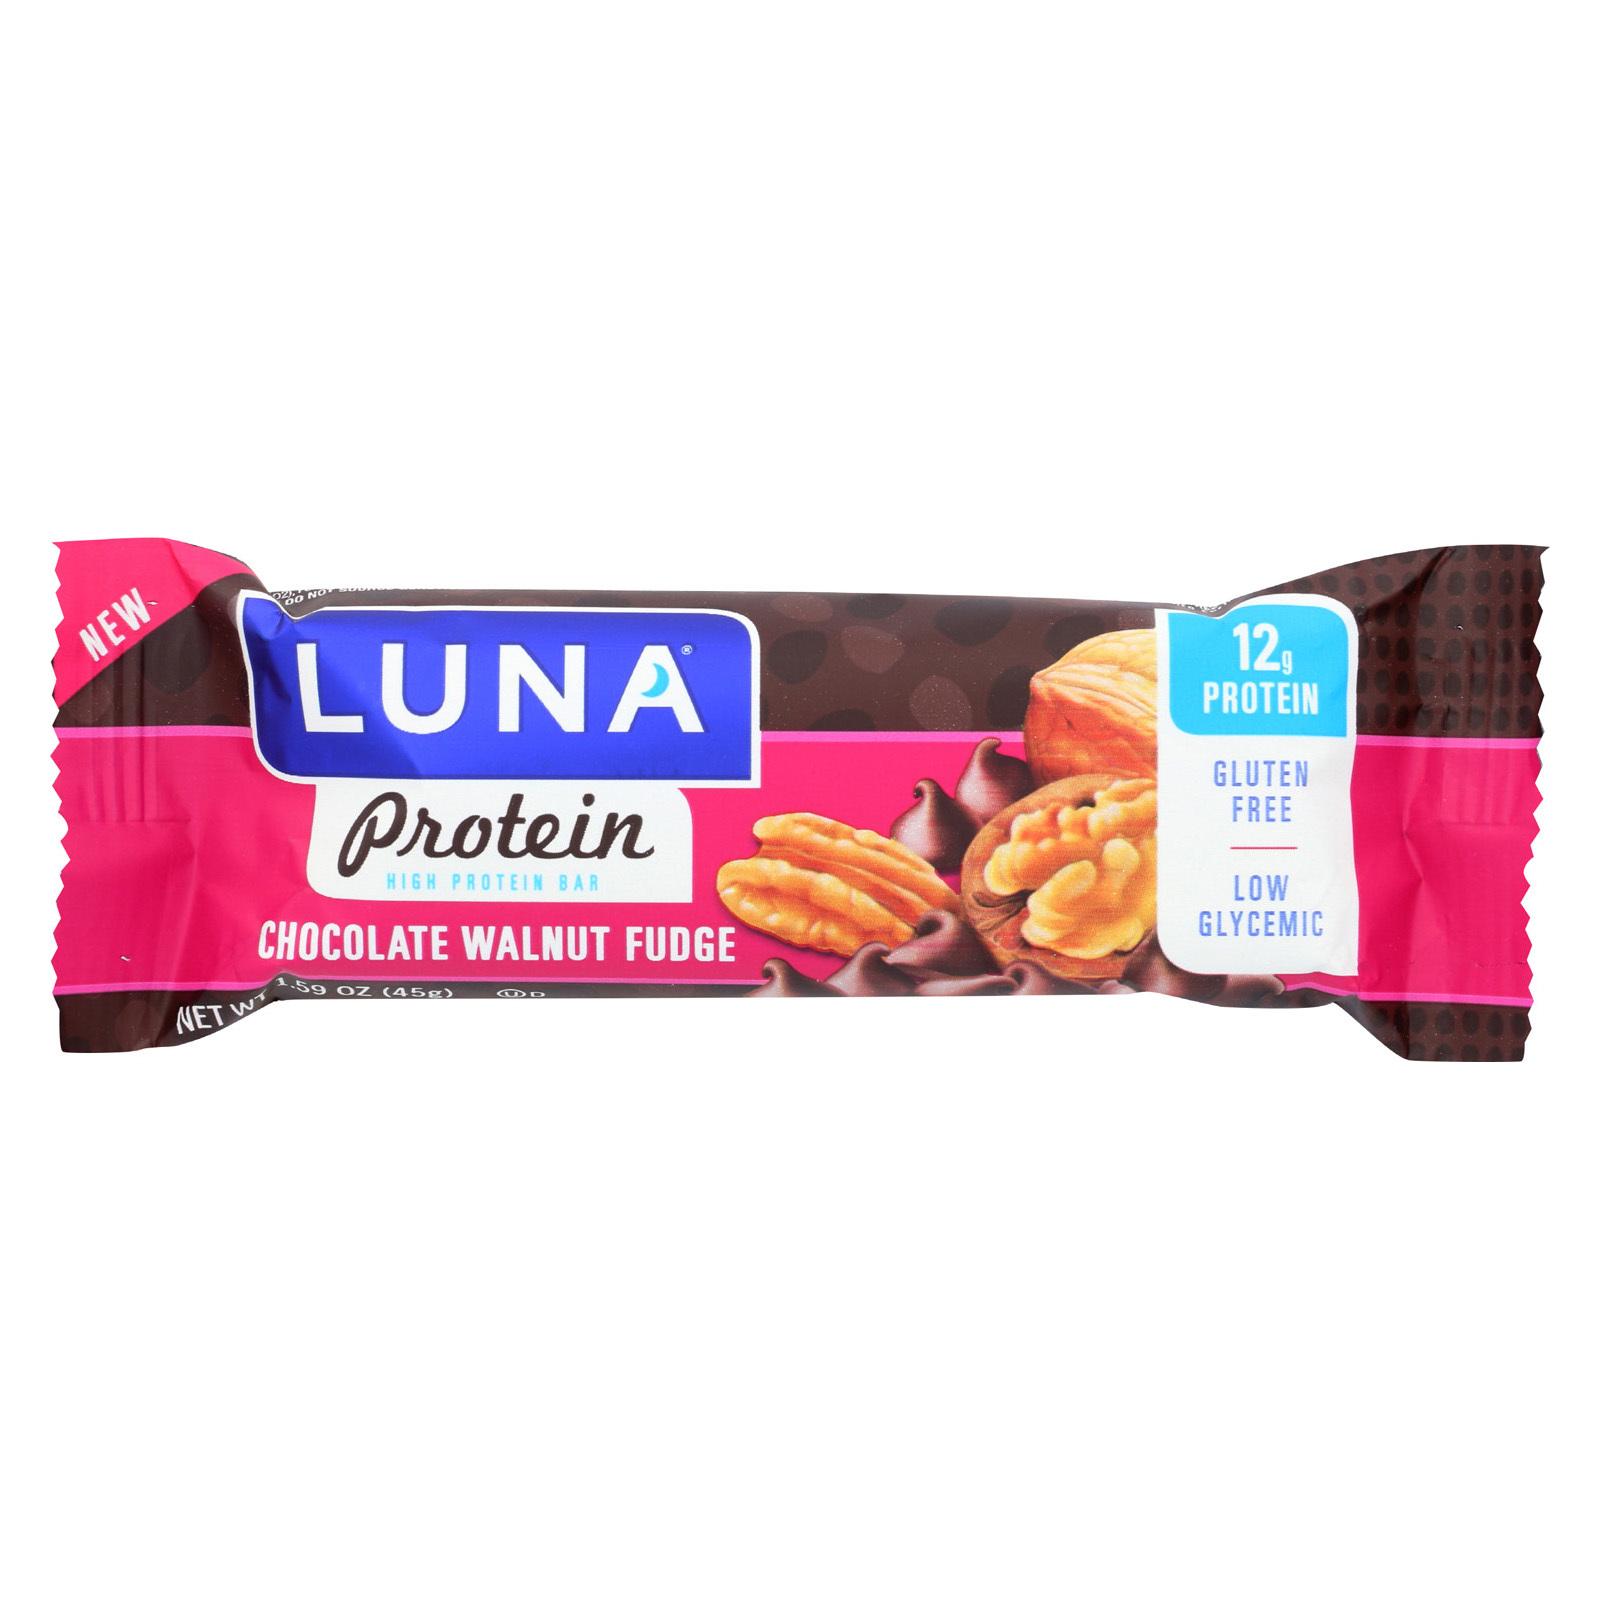 Luna Protein Bar - Chocolate Walnut Fudge - Case of 12 - 1.59 oz